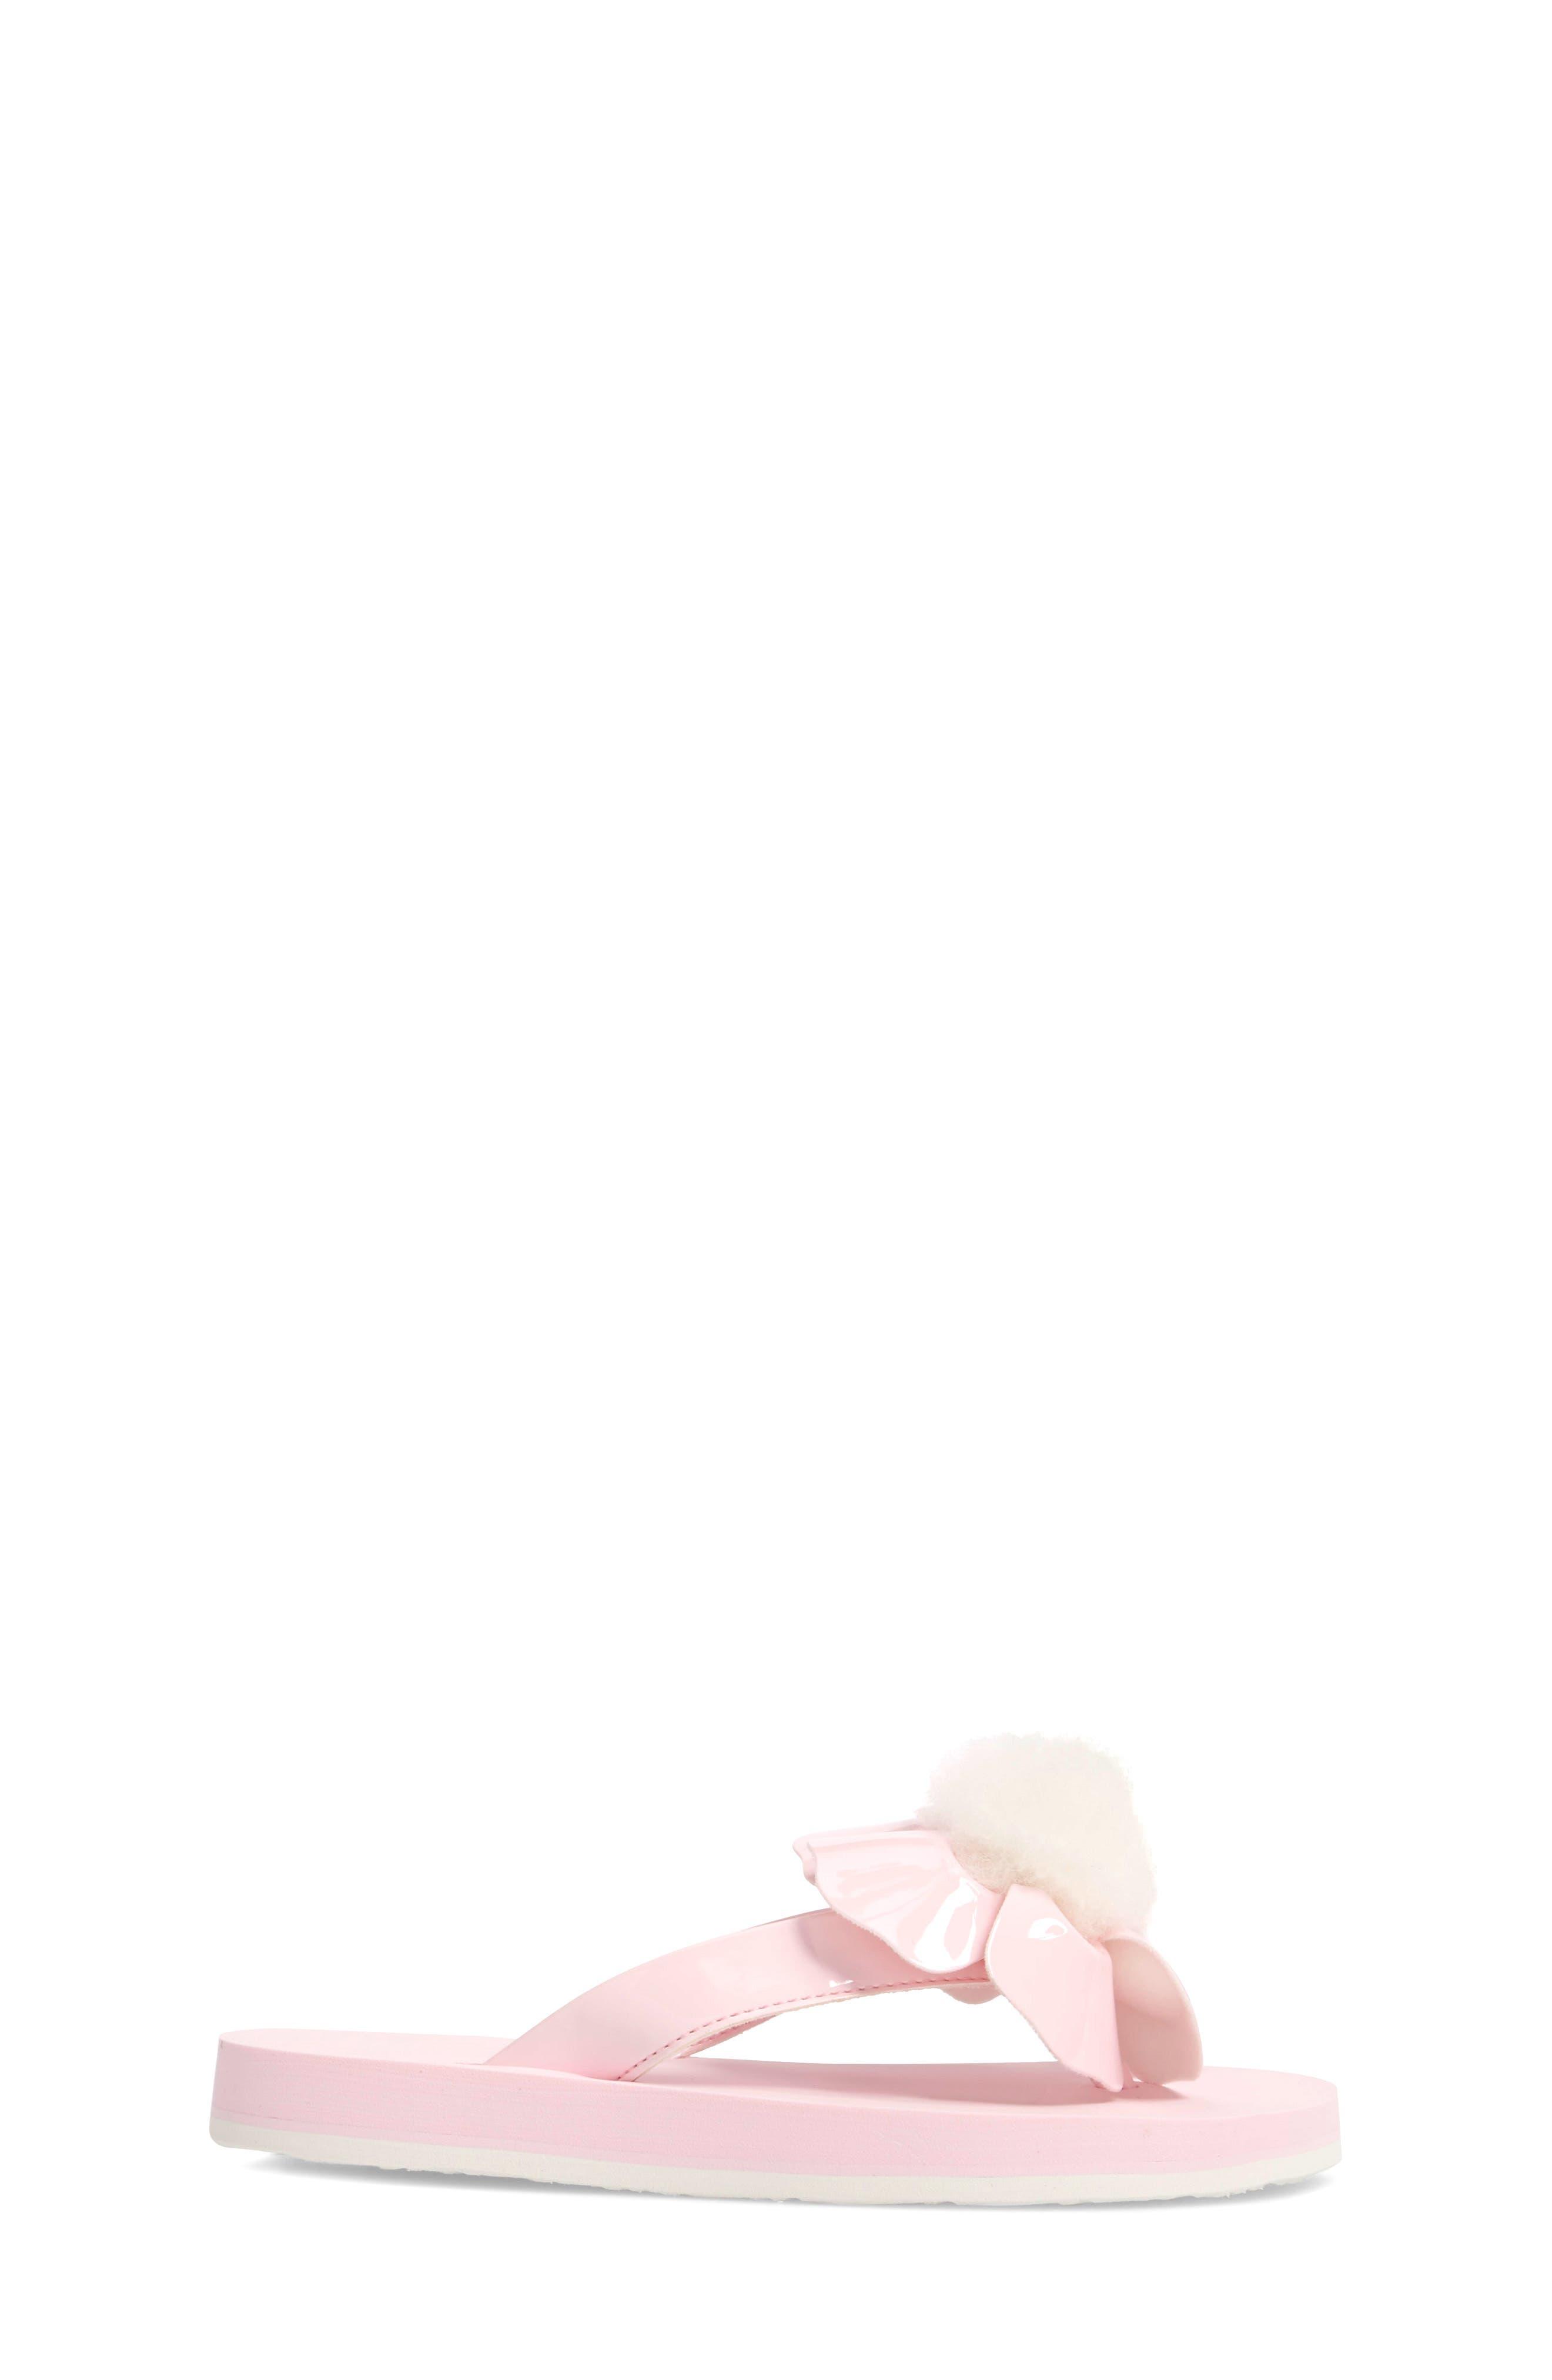 Poppy Genuine Shearling Flip Flop,                             Alternate thumbnail 8, color,